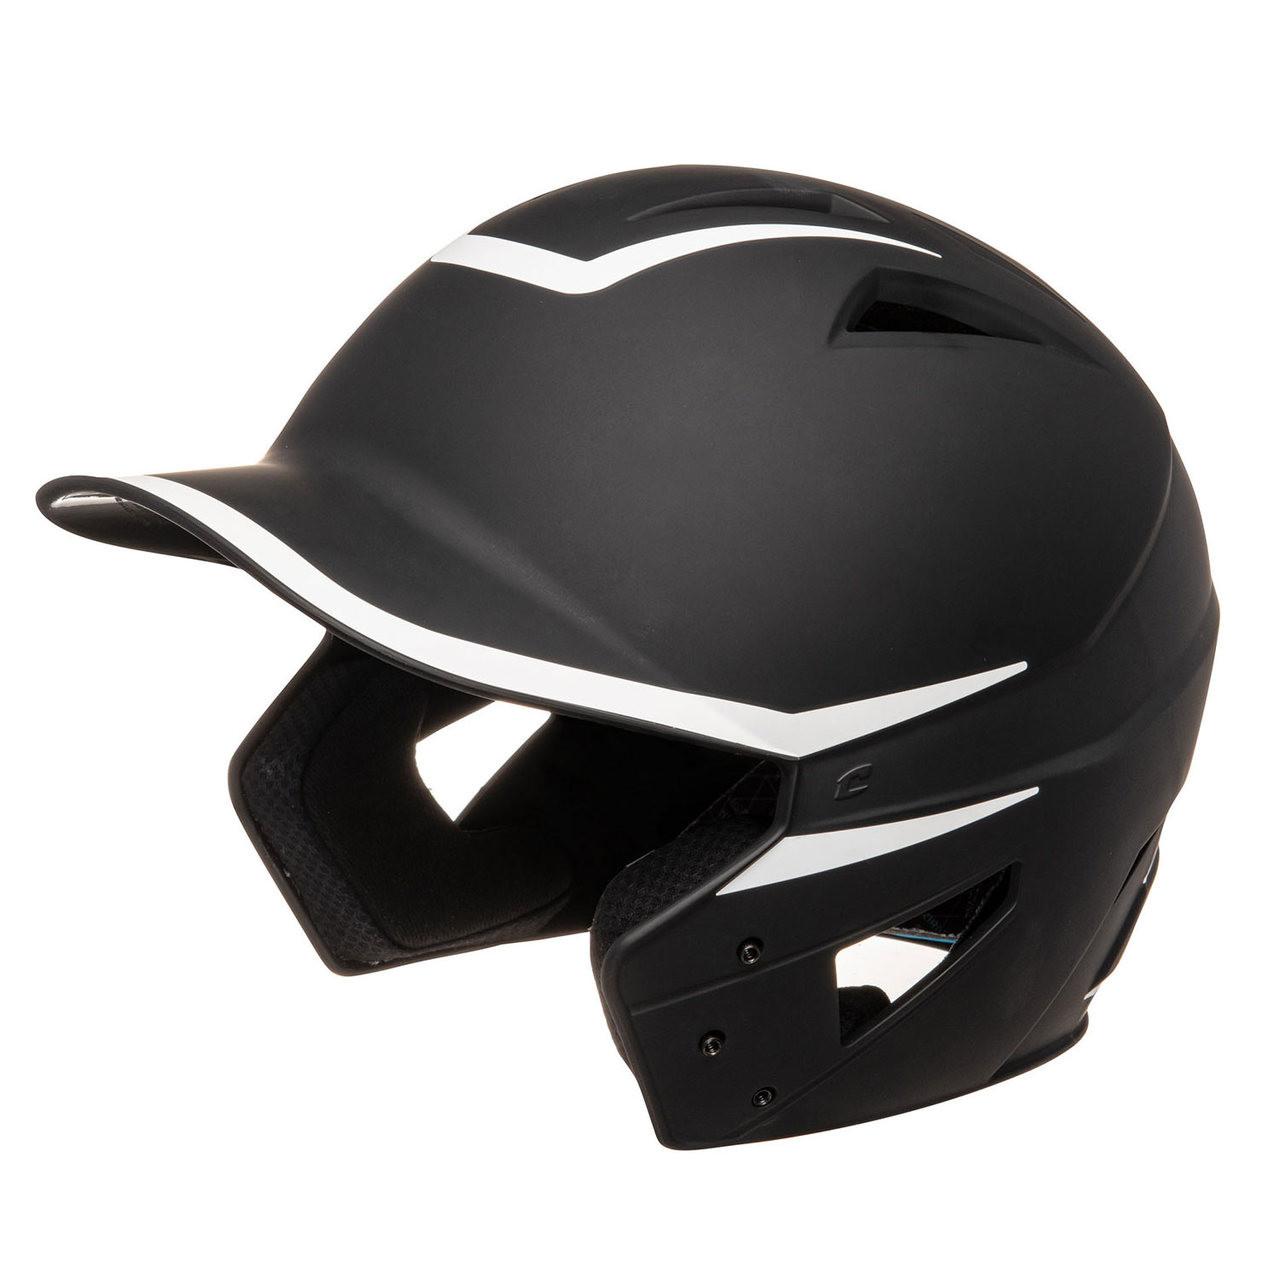 Champro Sports HX Legend Batting Helmet